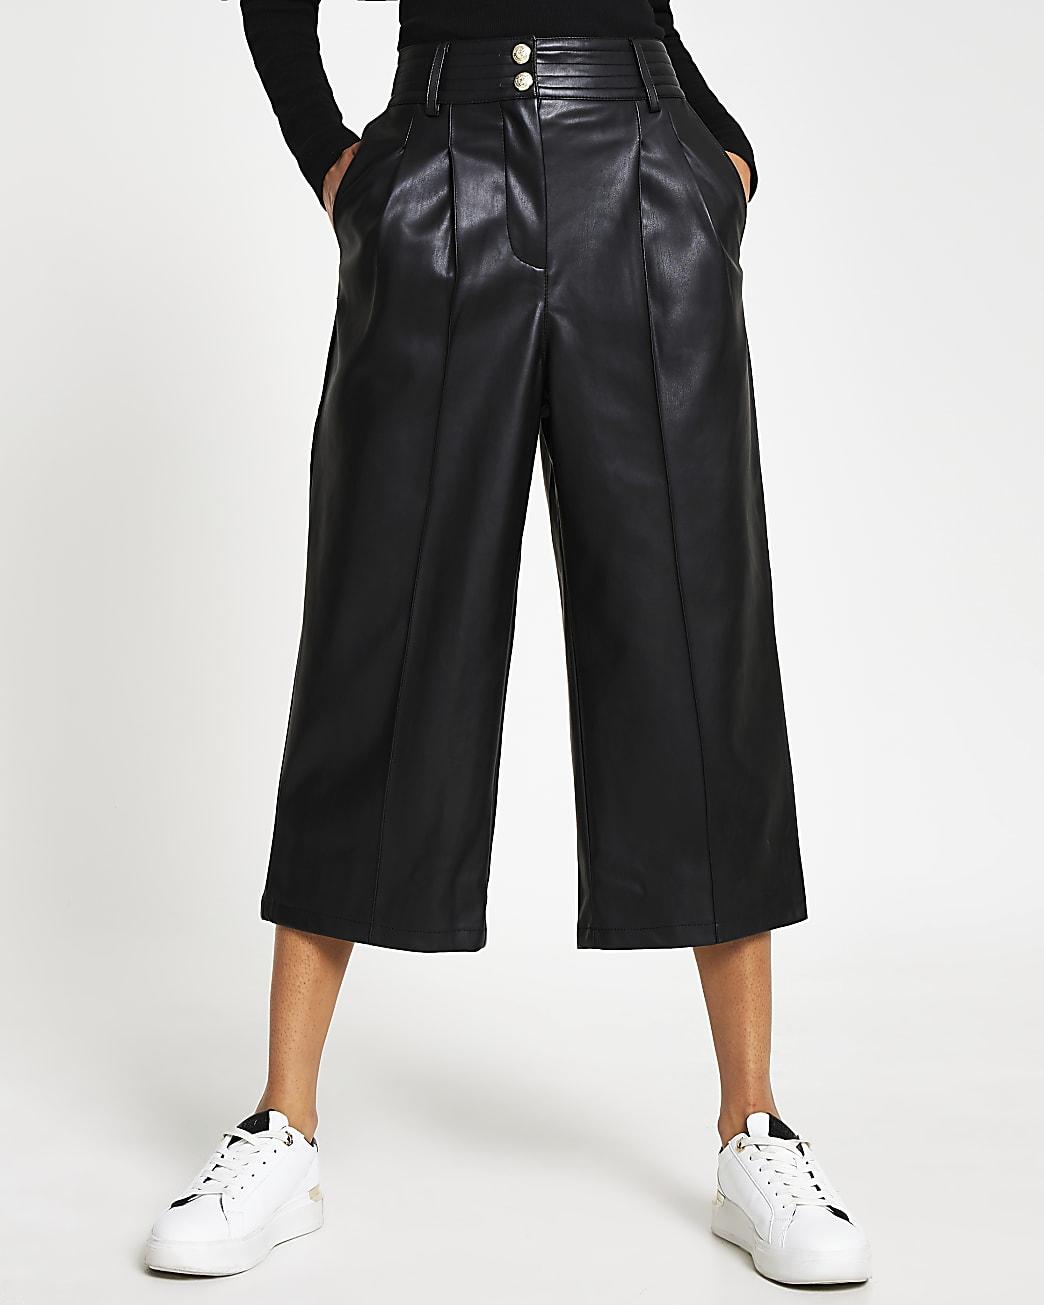 Black faux leather culottes